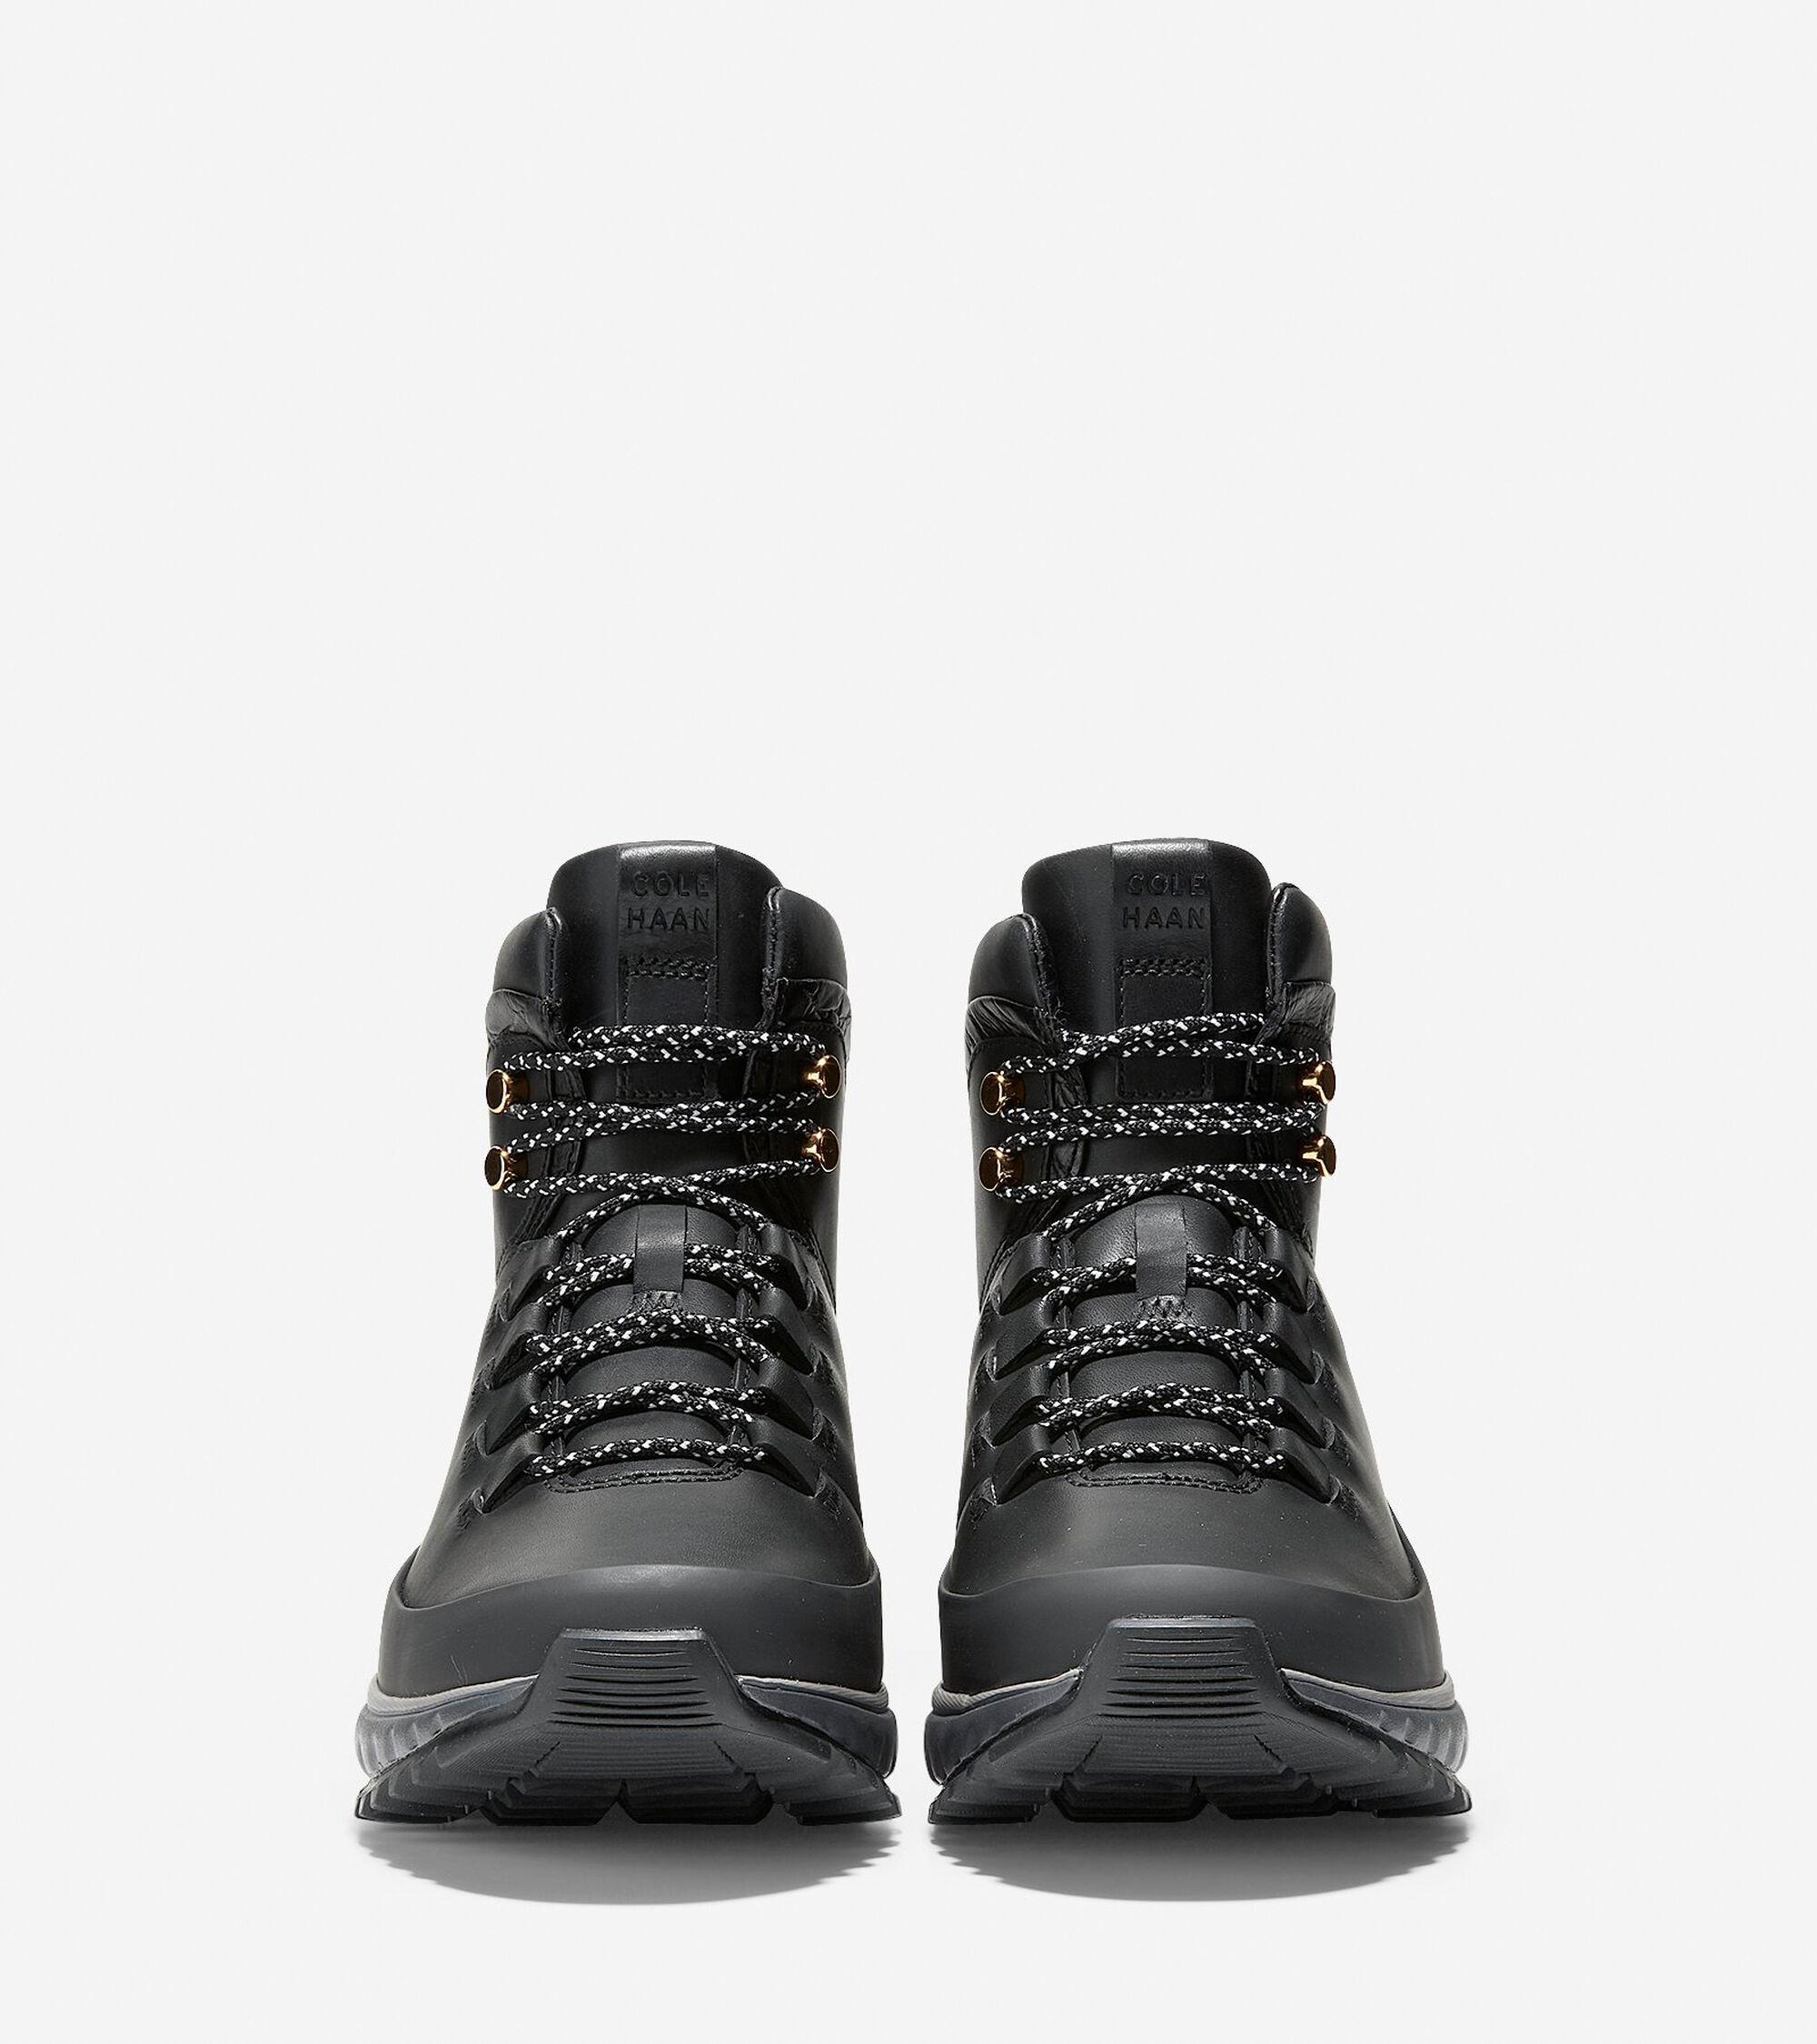 2427a65d4b4 Men s ZEROGRAND All-Terrain Waterproof Hiker Boots in Black